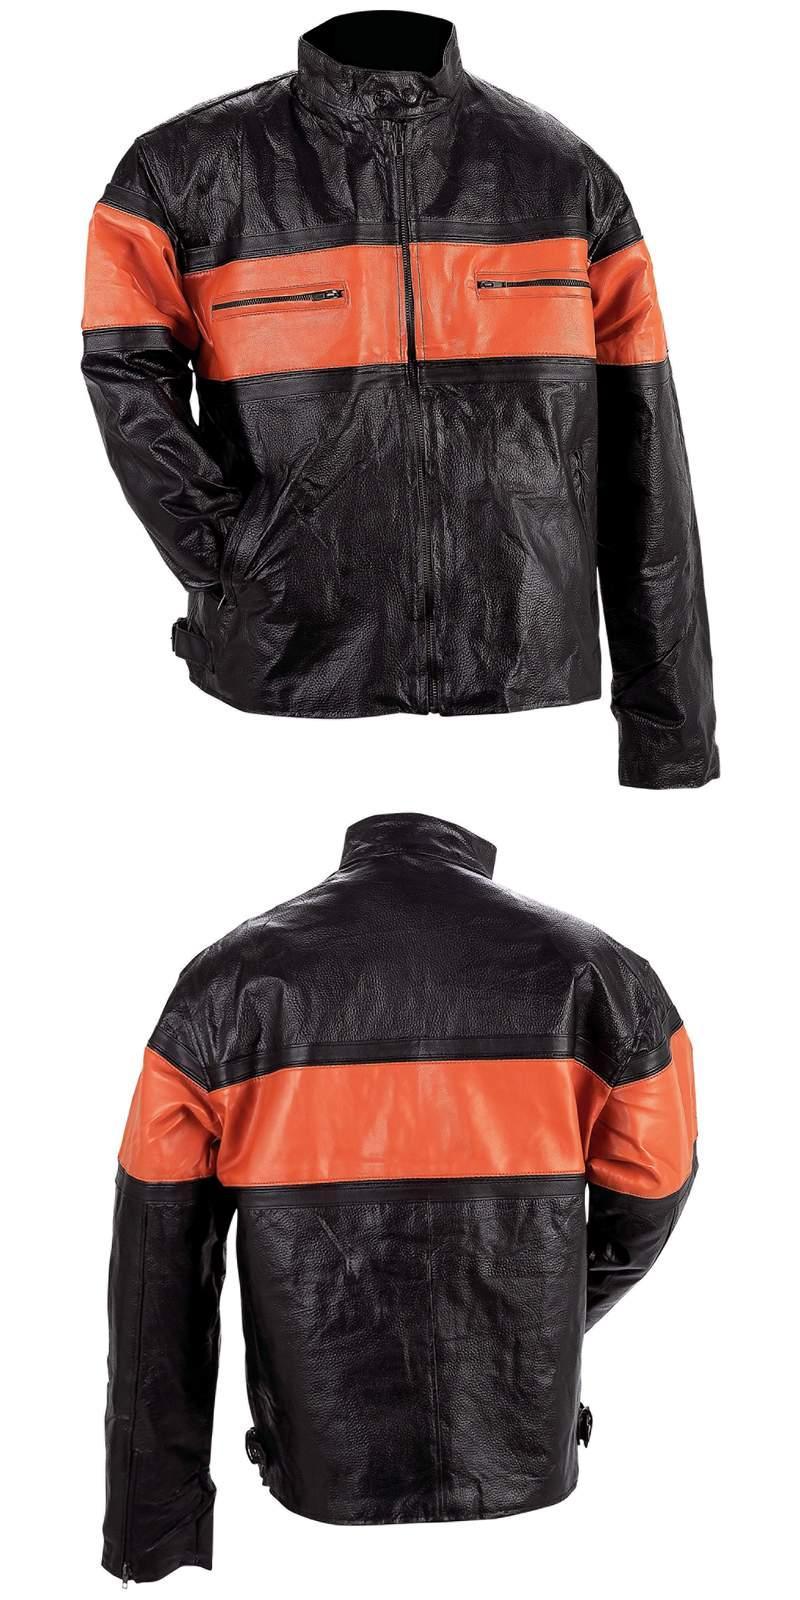 Leather Men's Jackets (GFMMCOR)